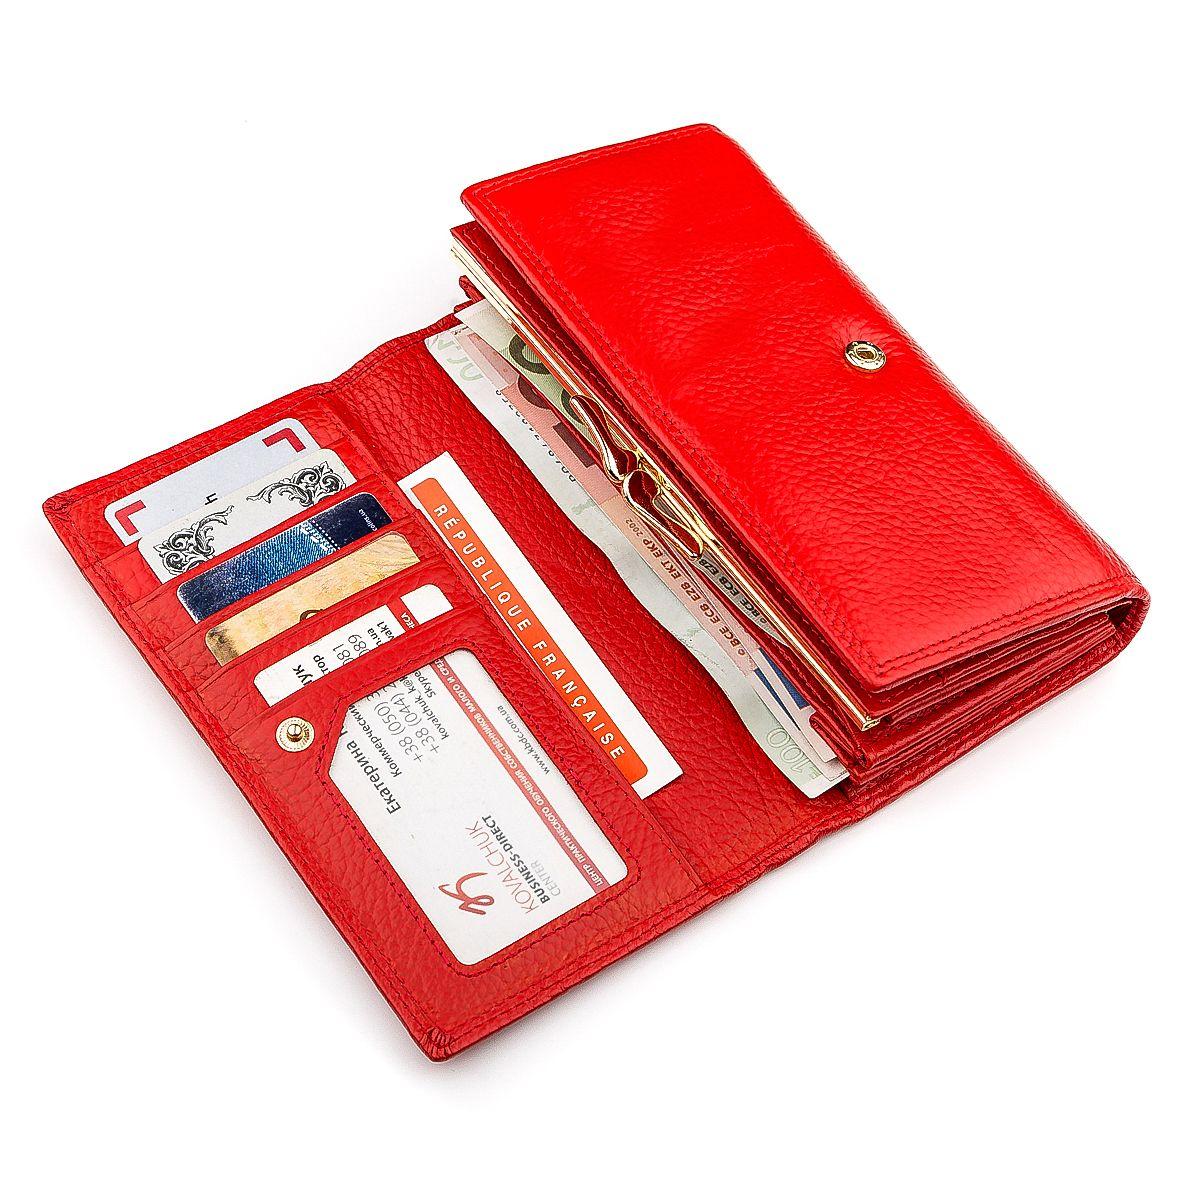 c44e16bfd86d Кошелек женский Boston 18493 (S9001B) яркий Красный: цена - 776 грн ...